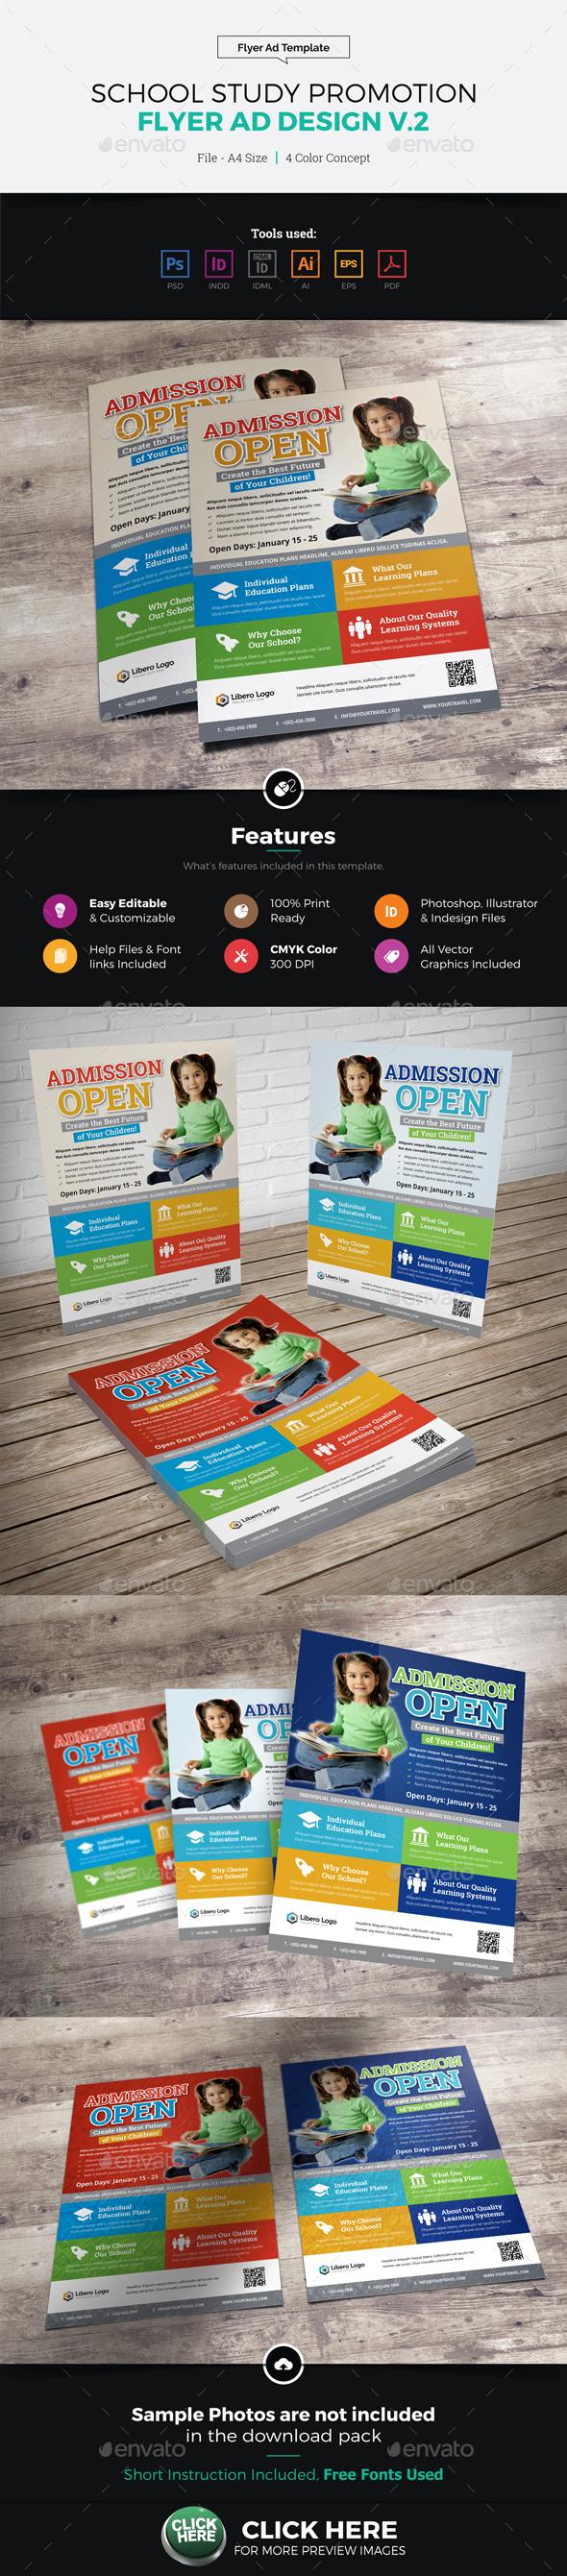 School Study Promotion Flyer Ad v2 - Corporate Flyers